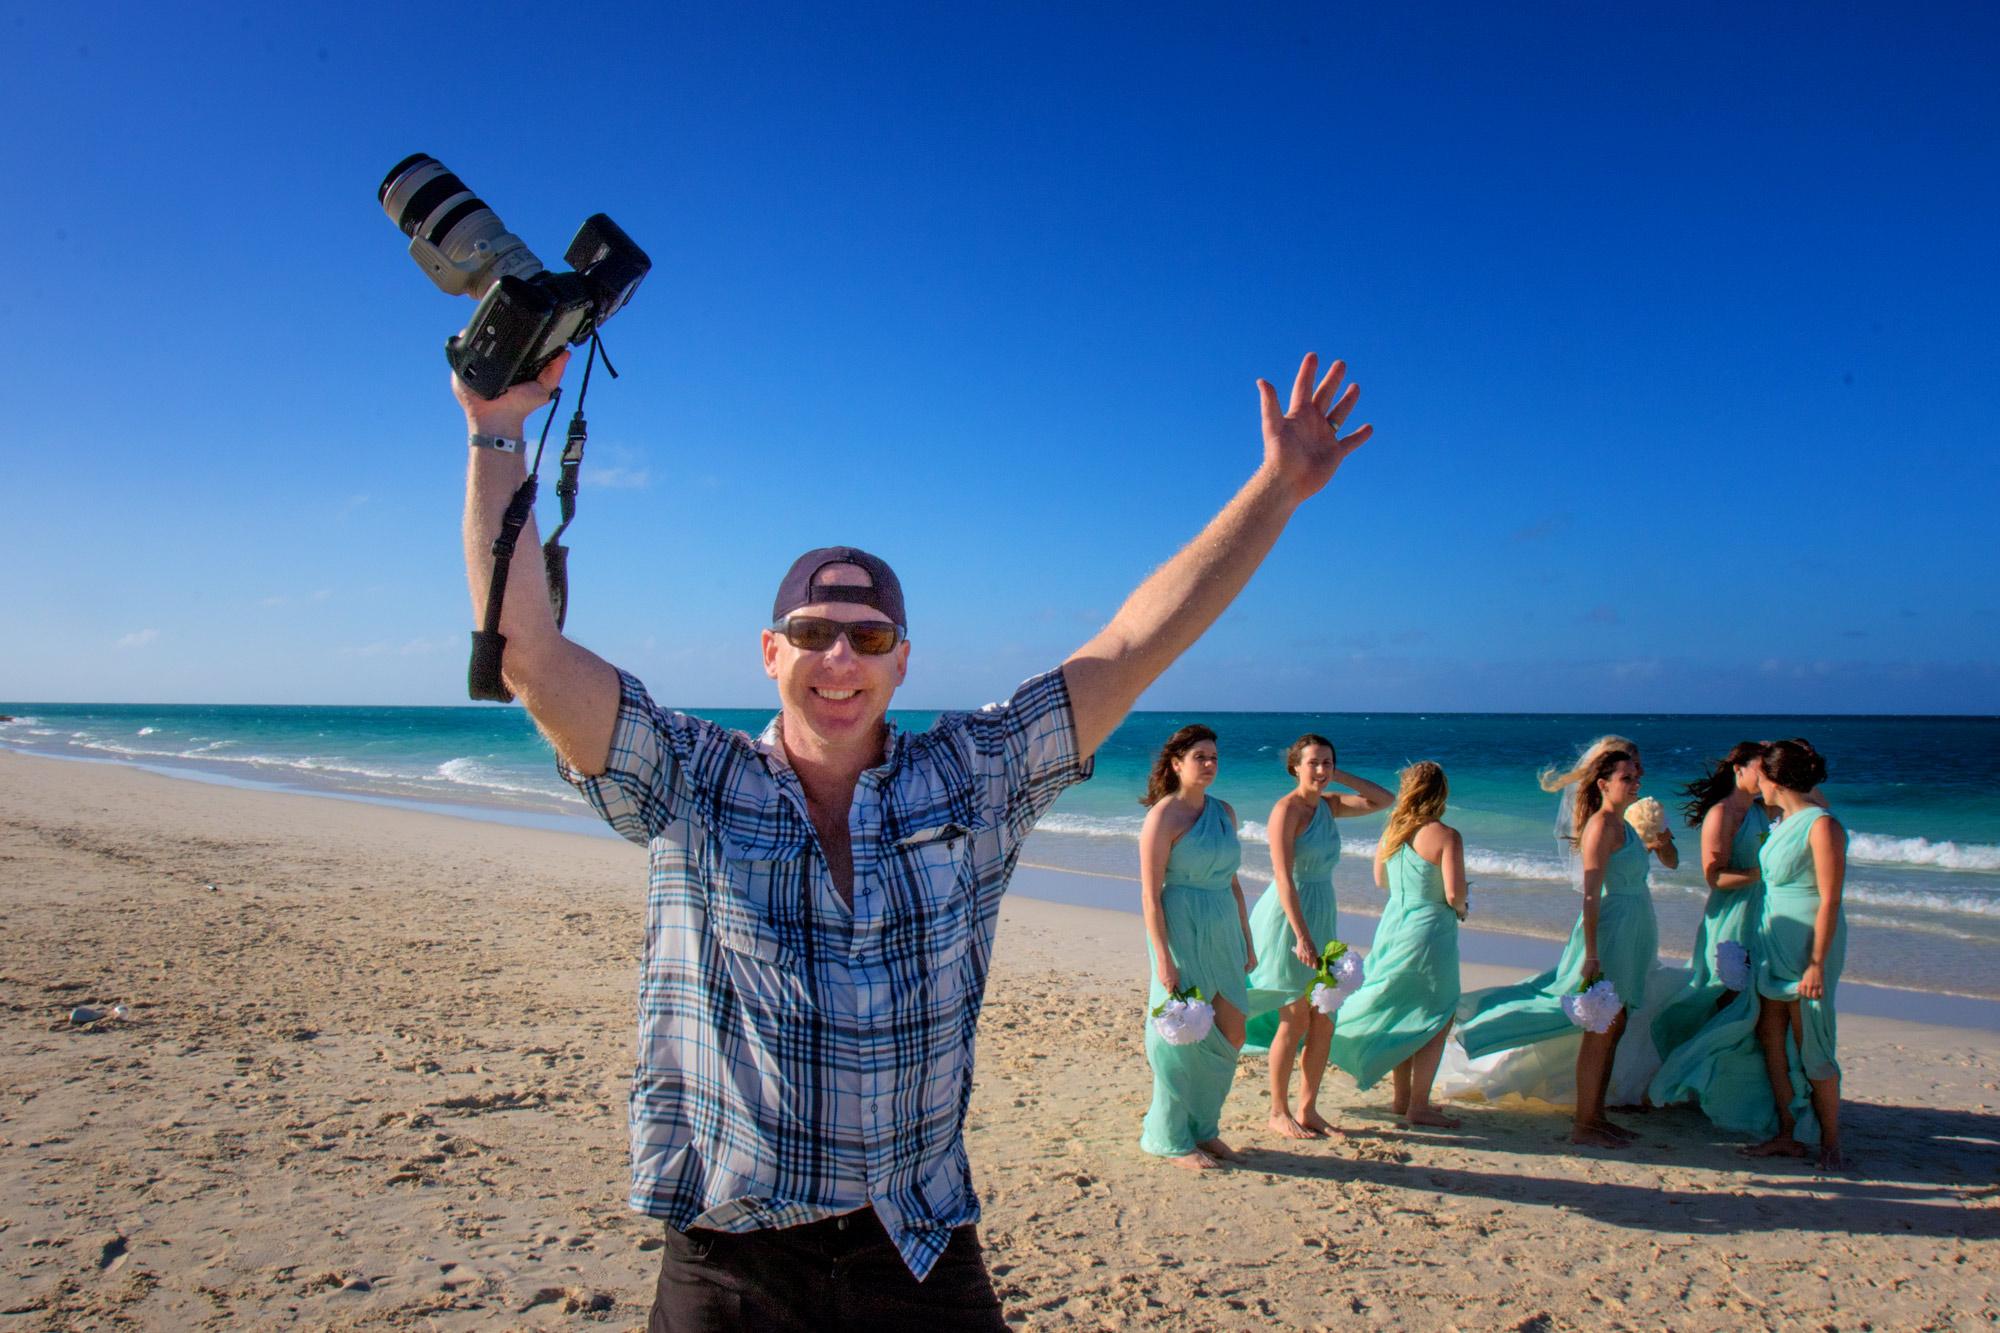 Destination Wedding photographers, Troy & Shirleen Burnett on location in Dominican Republic